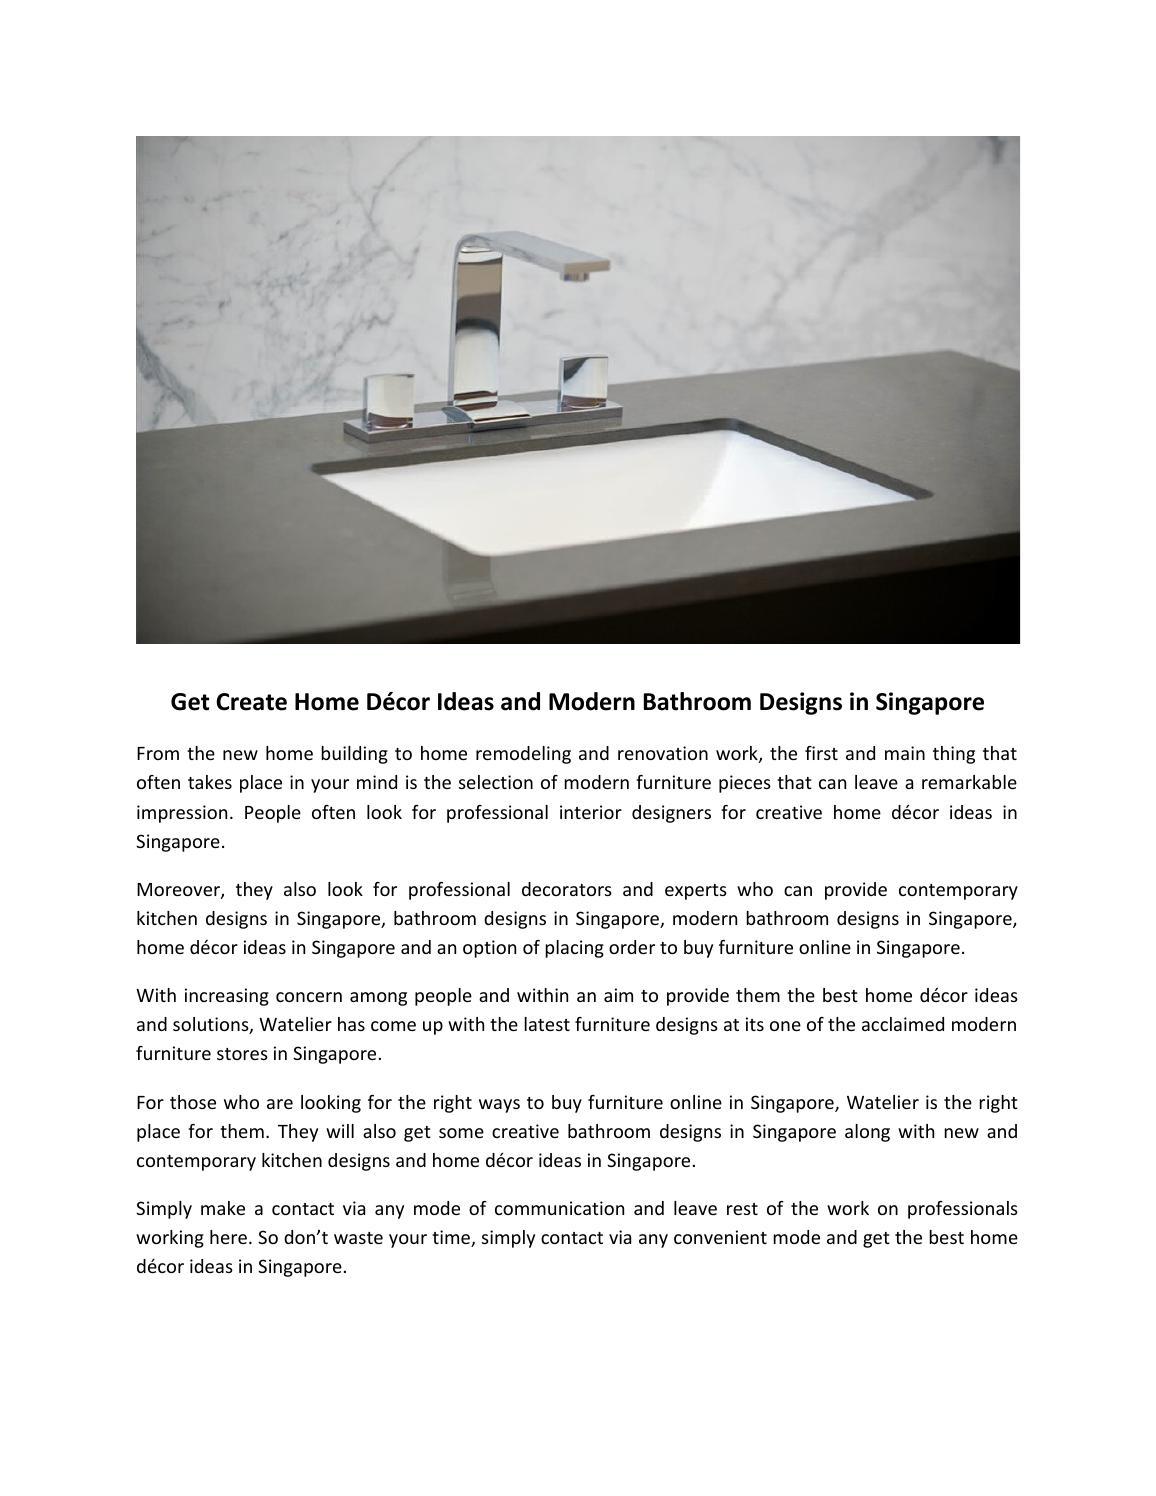 Get create home décor ideas and modern bathroom designs in singapore ...